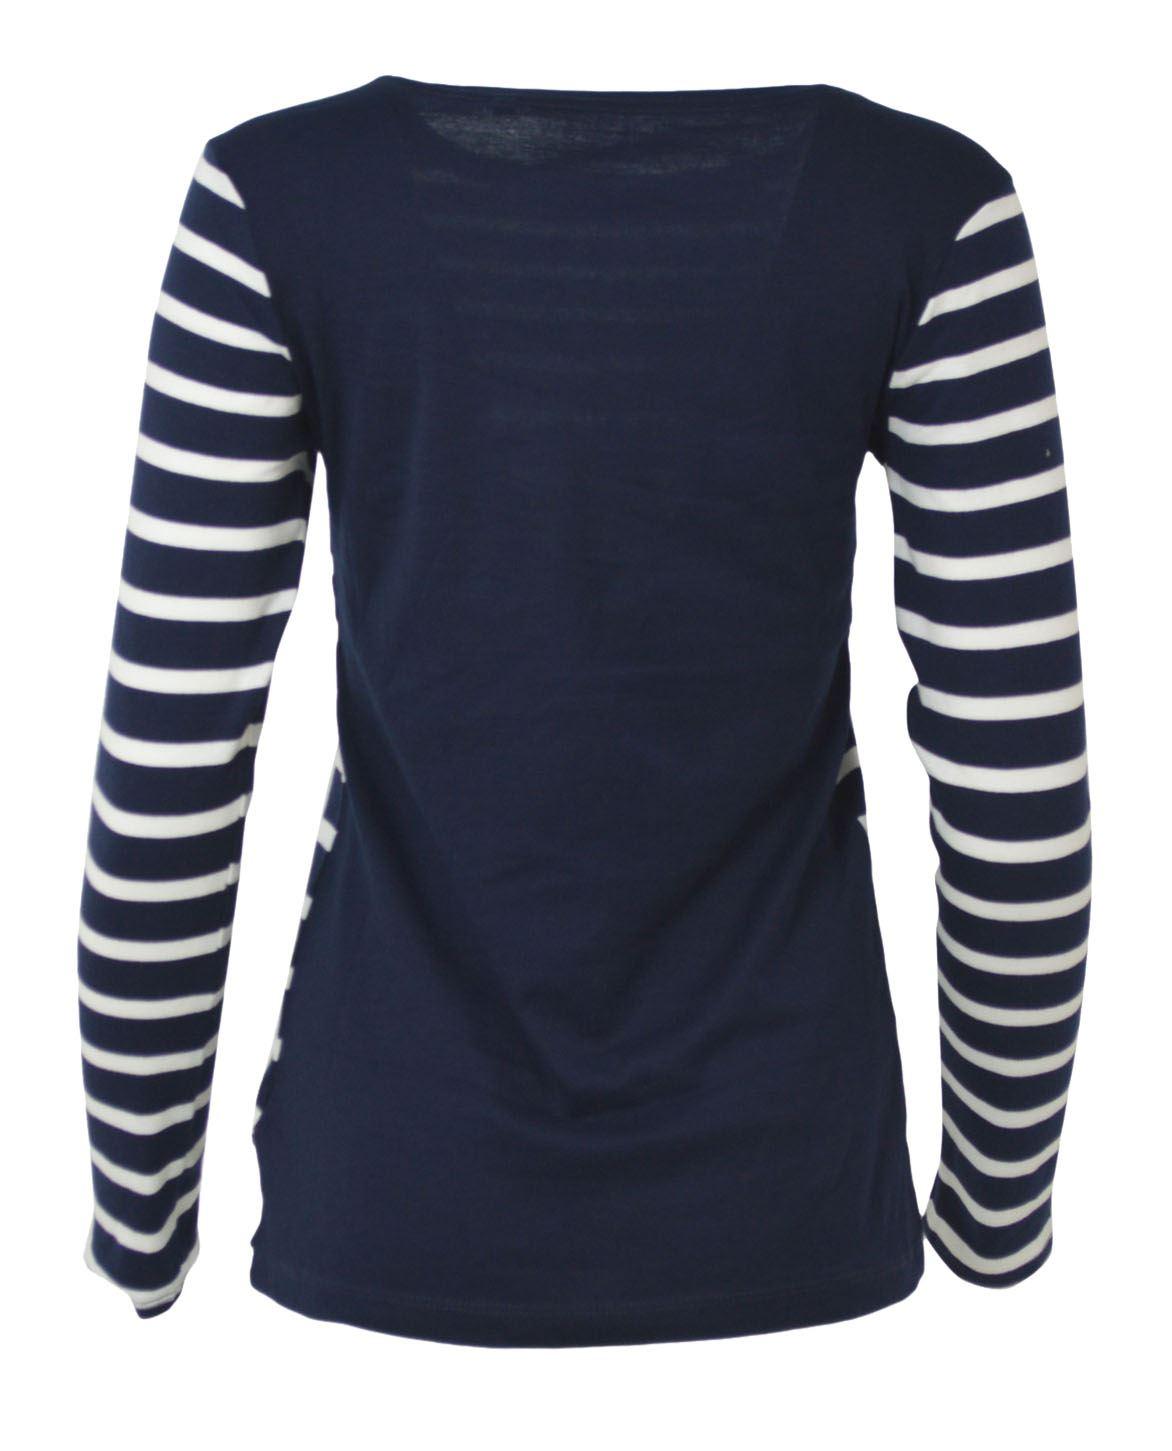 Womens-Crew-Neck-Navy-Black-White-Striped-Jersey-Top-Long-Sleeve-T-Shirt thumbnail 14